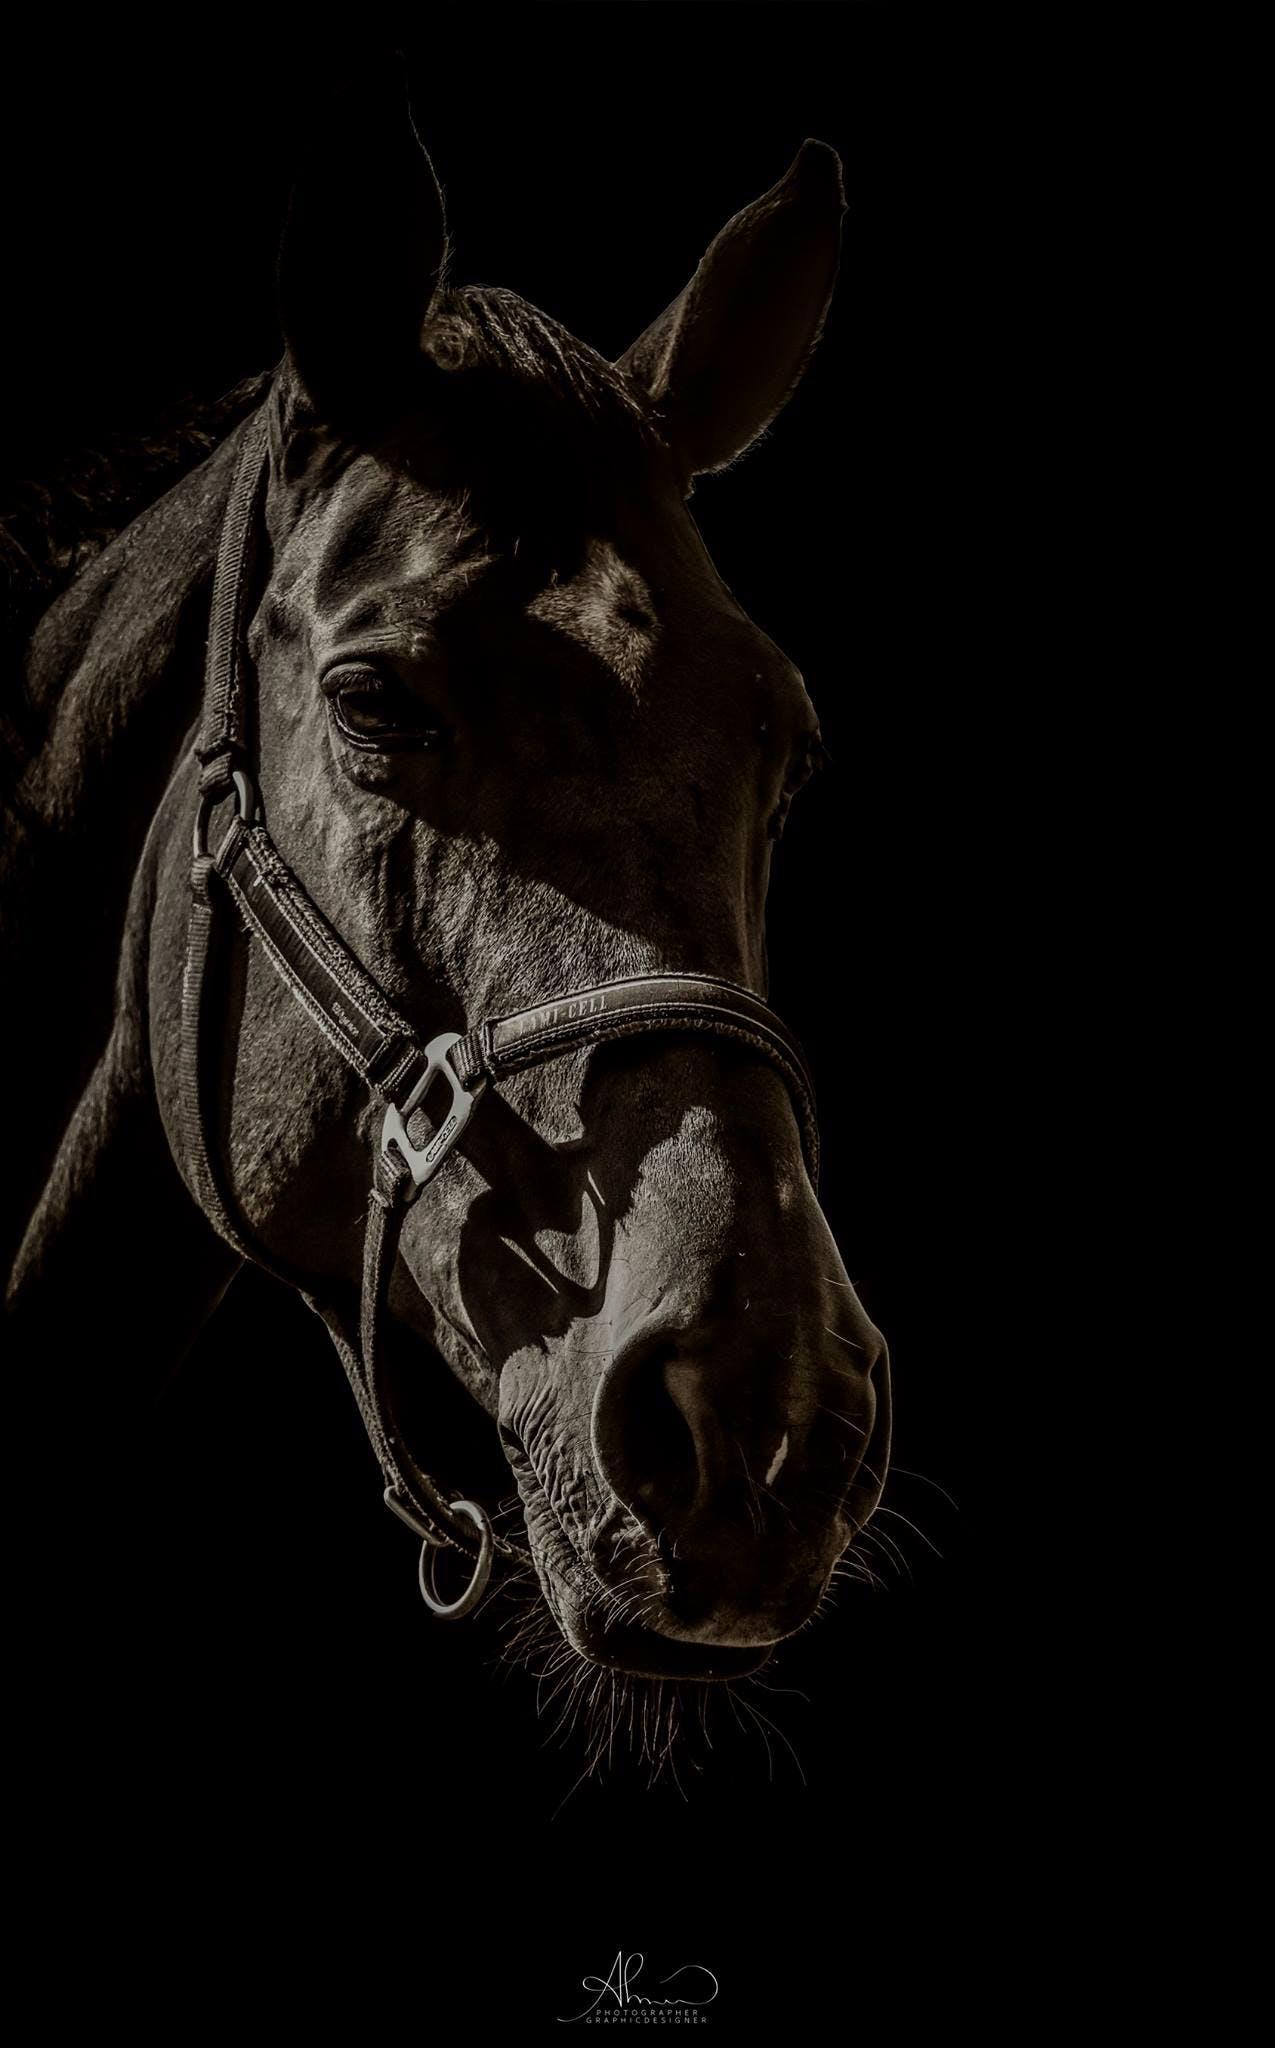 Free stock photo of animal, animal photography, animal portrait, animal world